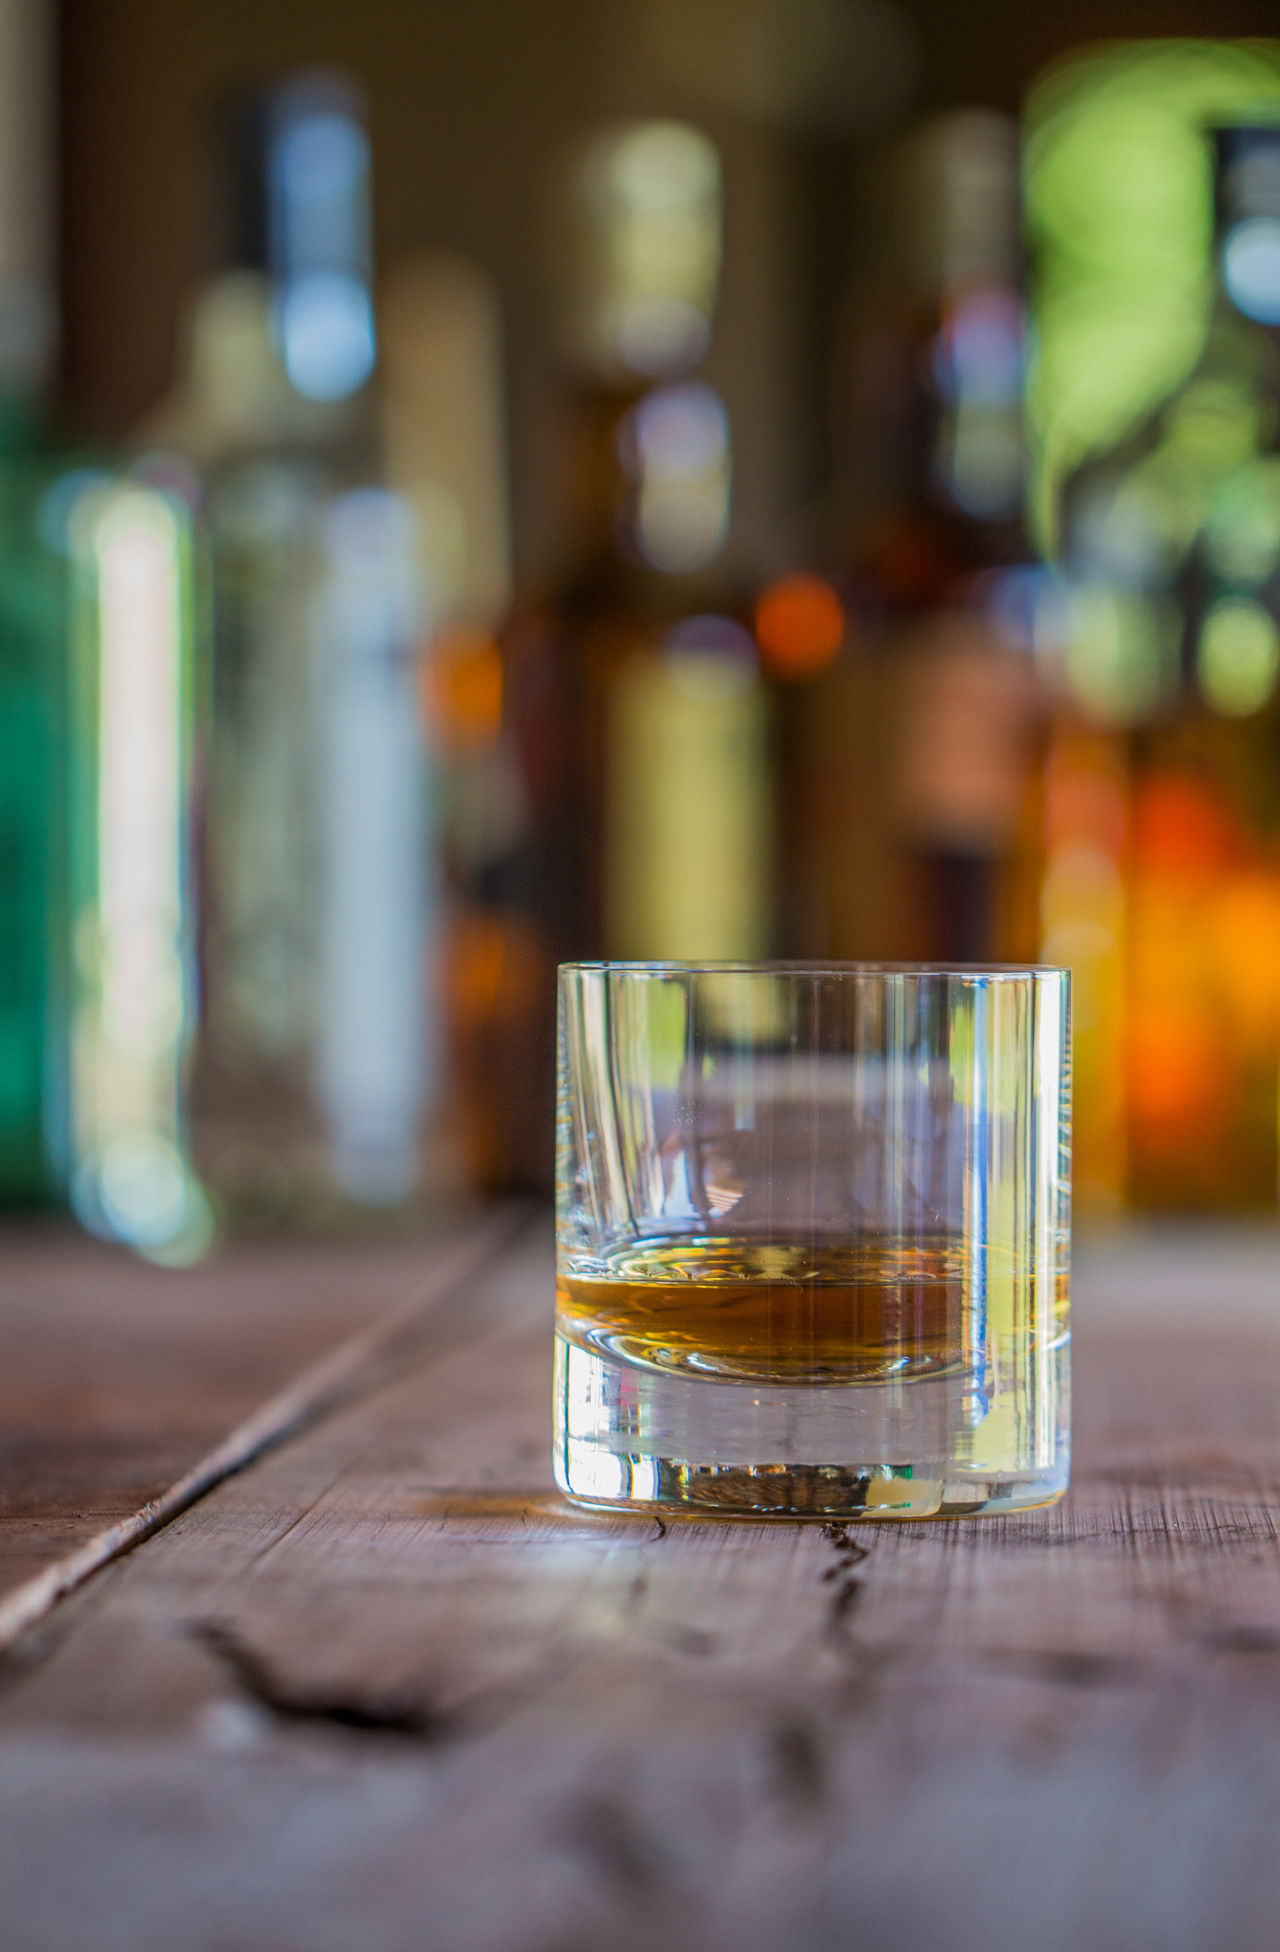 GLAMOR Status Barrel Wood Table Bar Bottles Whiskey Alcohol Close-up No People Drink Drinking Glass Golden